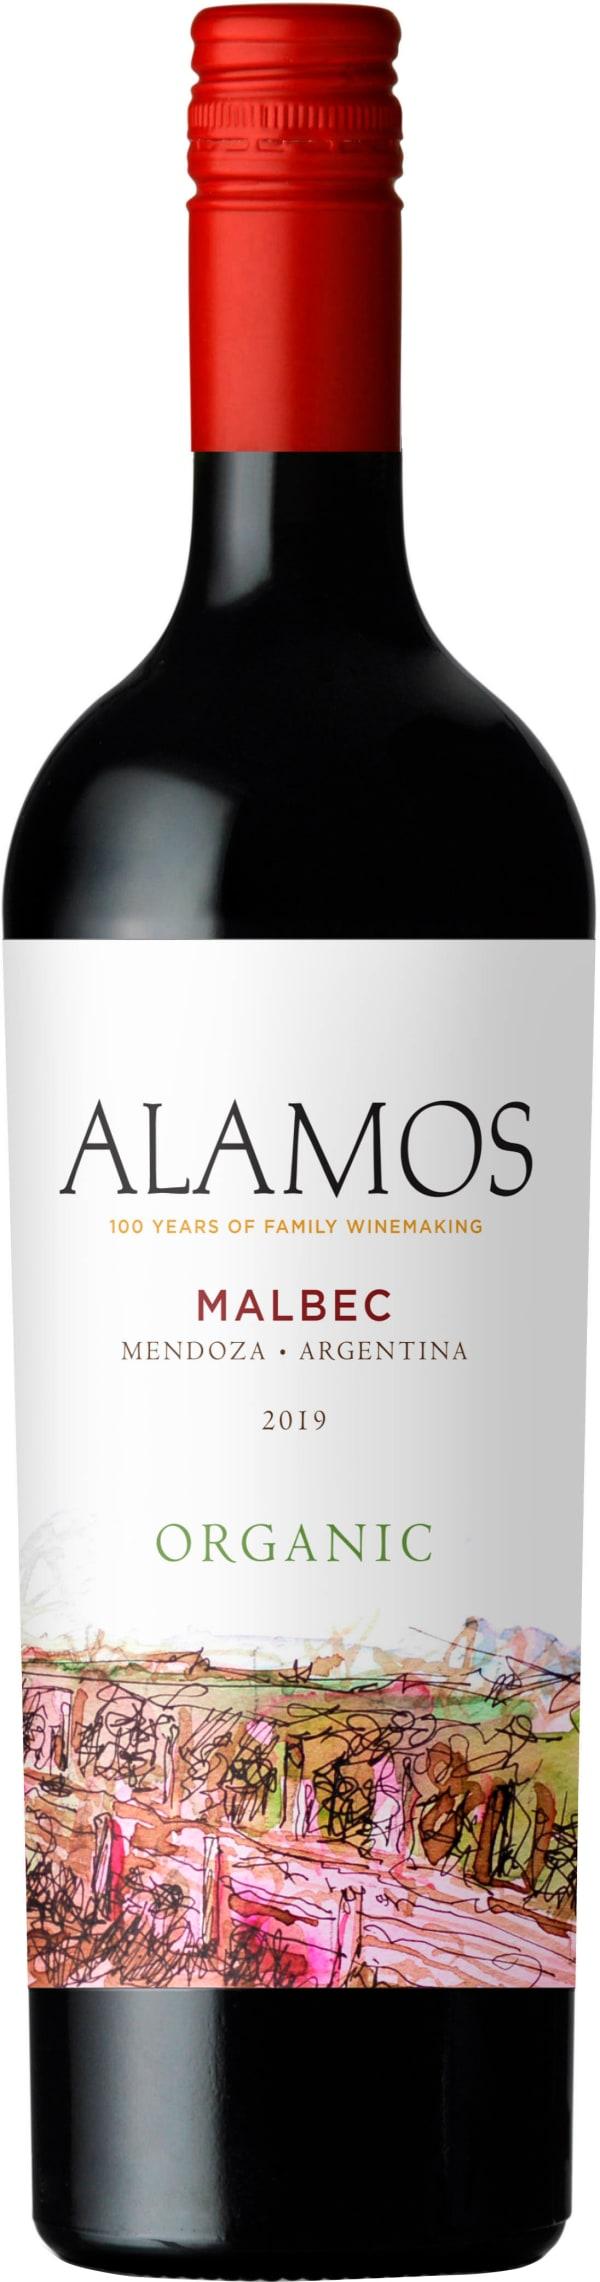 Alamos Malbec Organic 2019